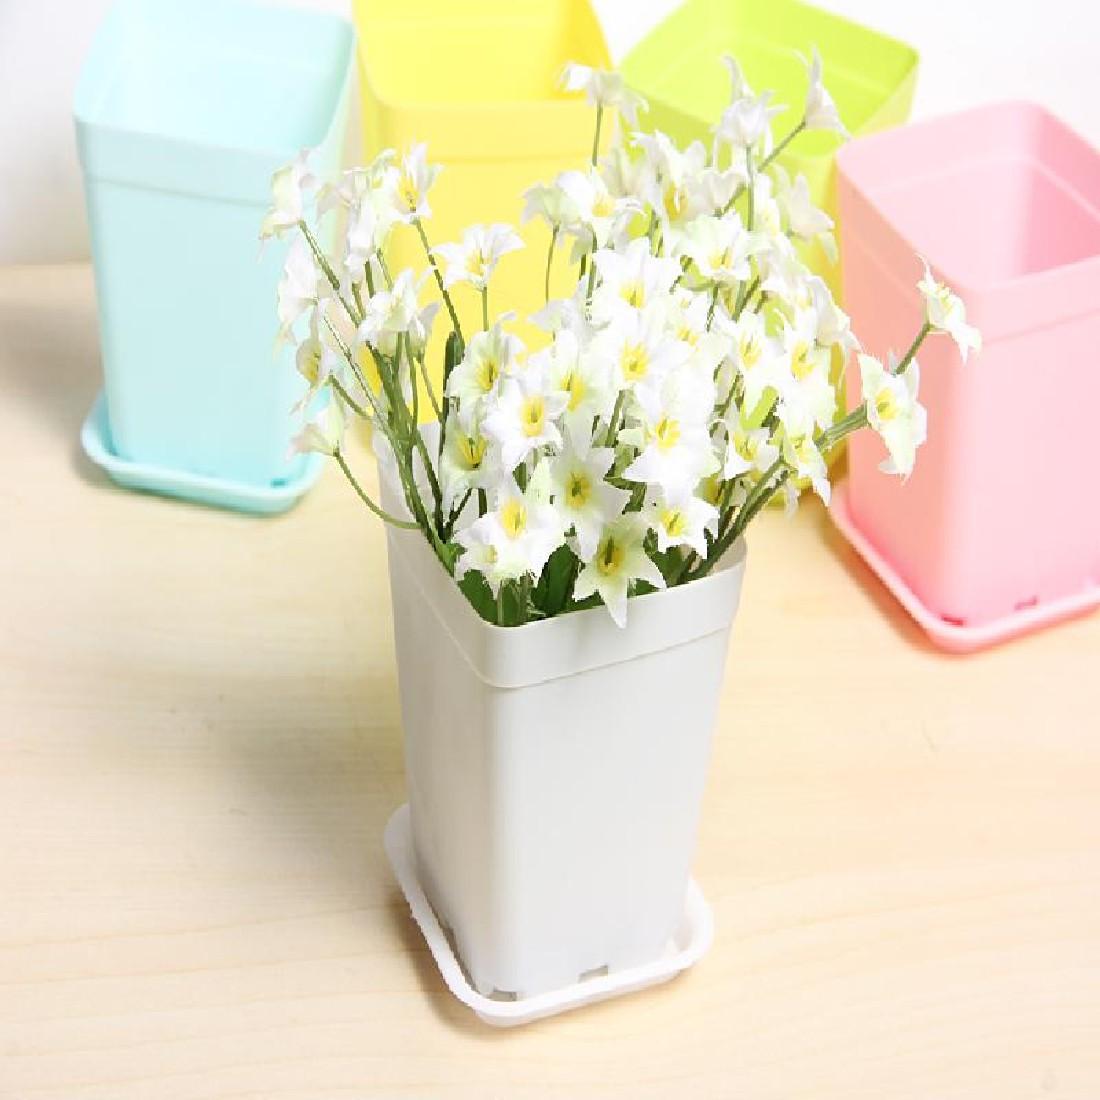 6pcspack Flower Pot Square Plastic Planter Nursery Garden Desk